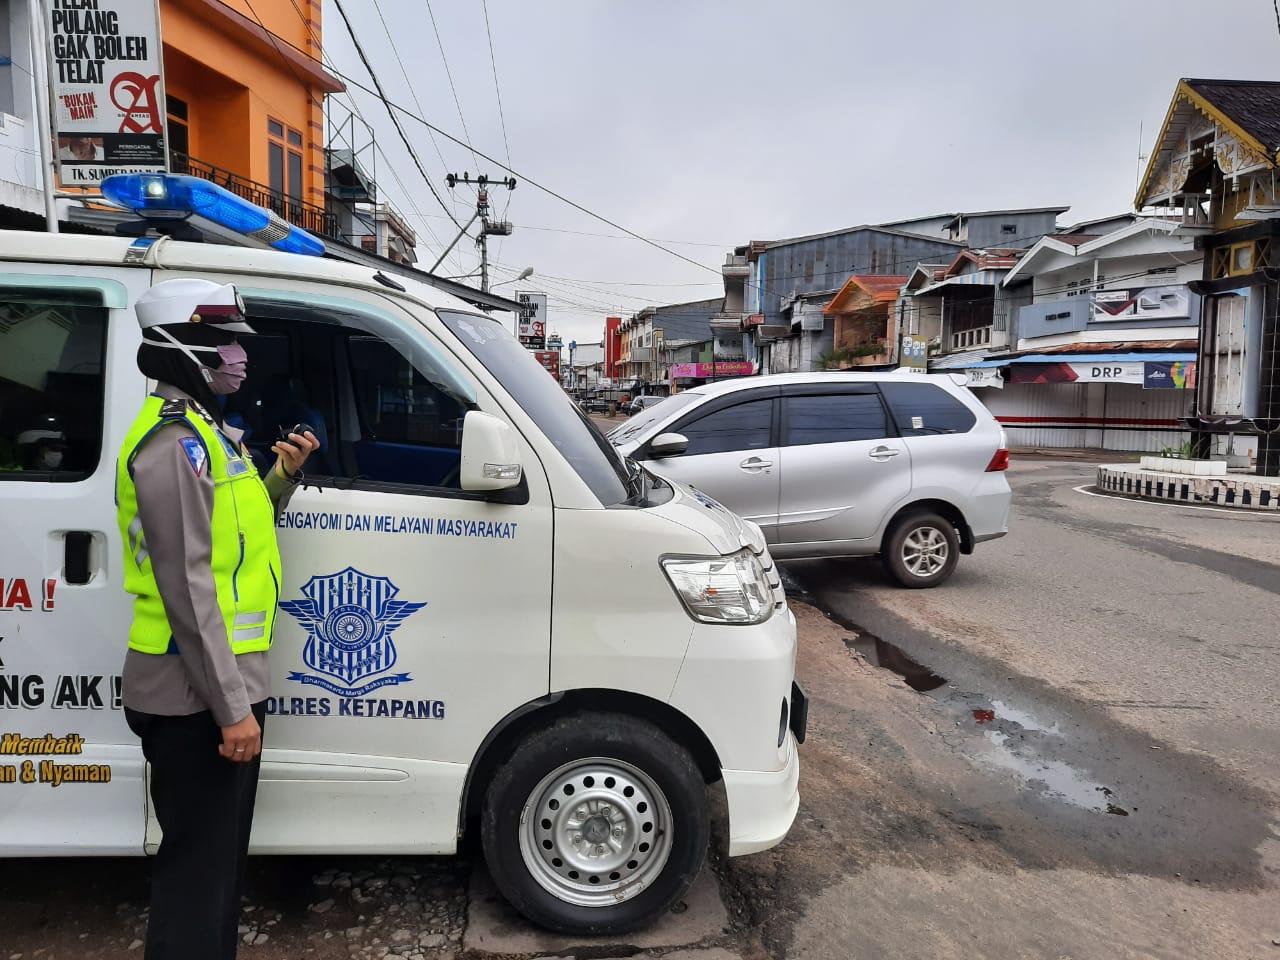 Penerangan Keliling Satlantas Polres Ketapang Beri Imbauan Pencegahan Covid-19